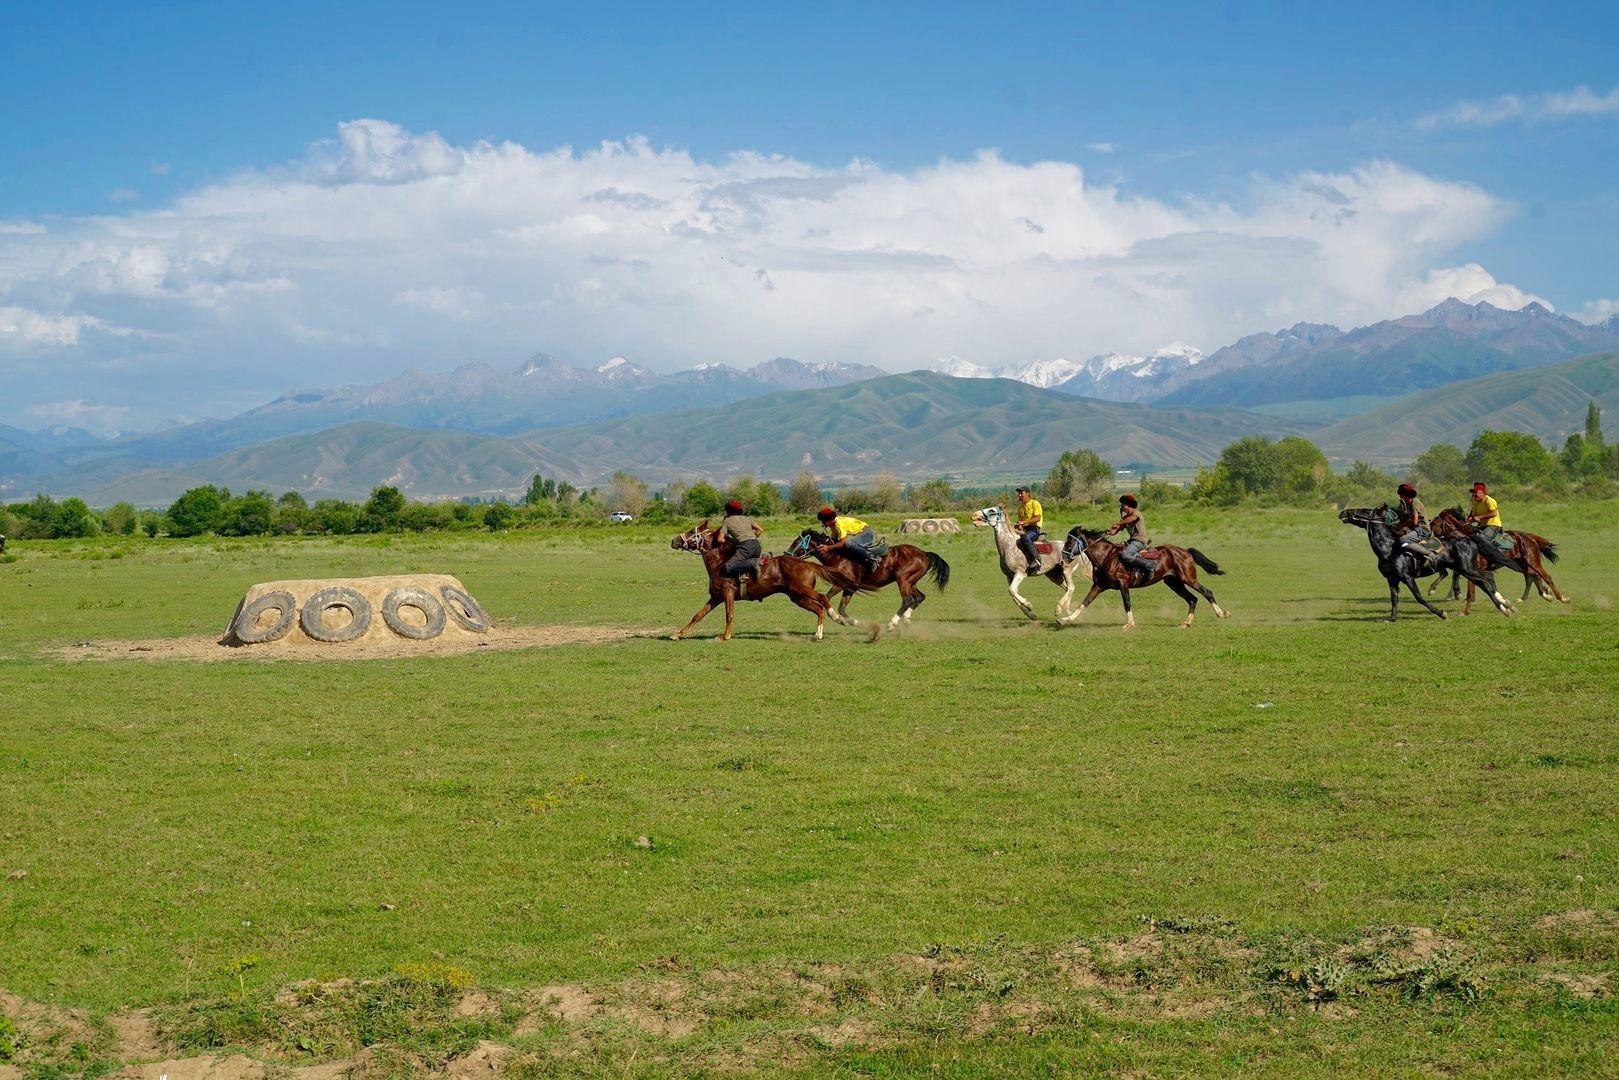 Kok Boru horse game played during Kyrgyzstan Tours & Nomad University